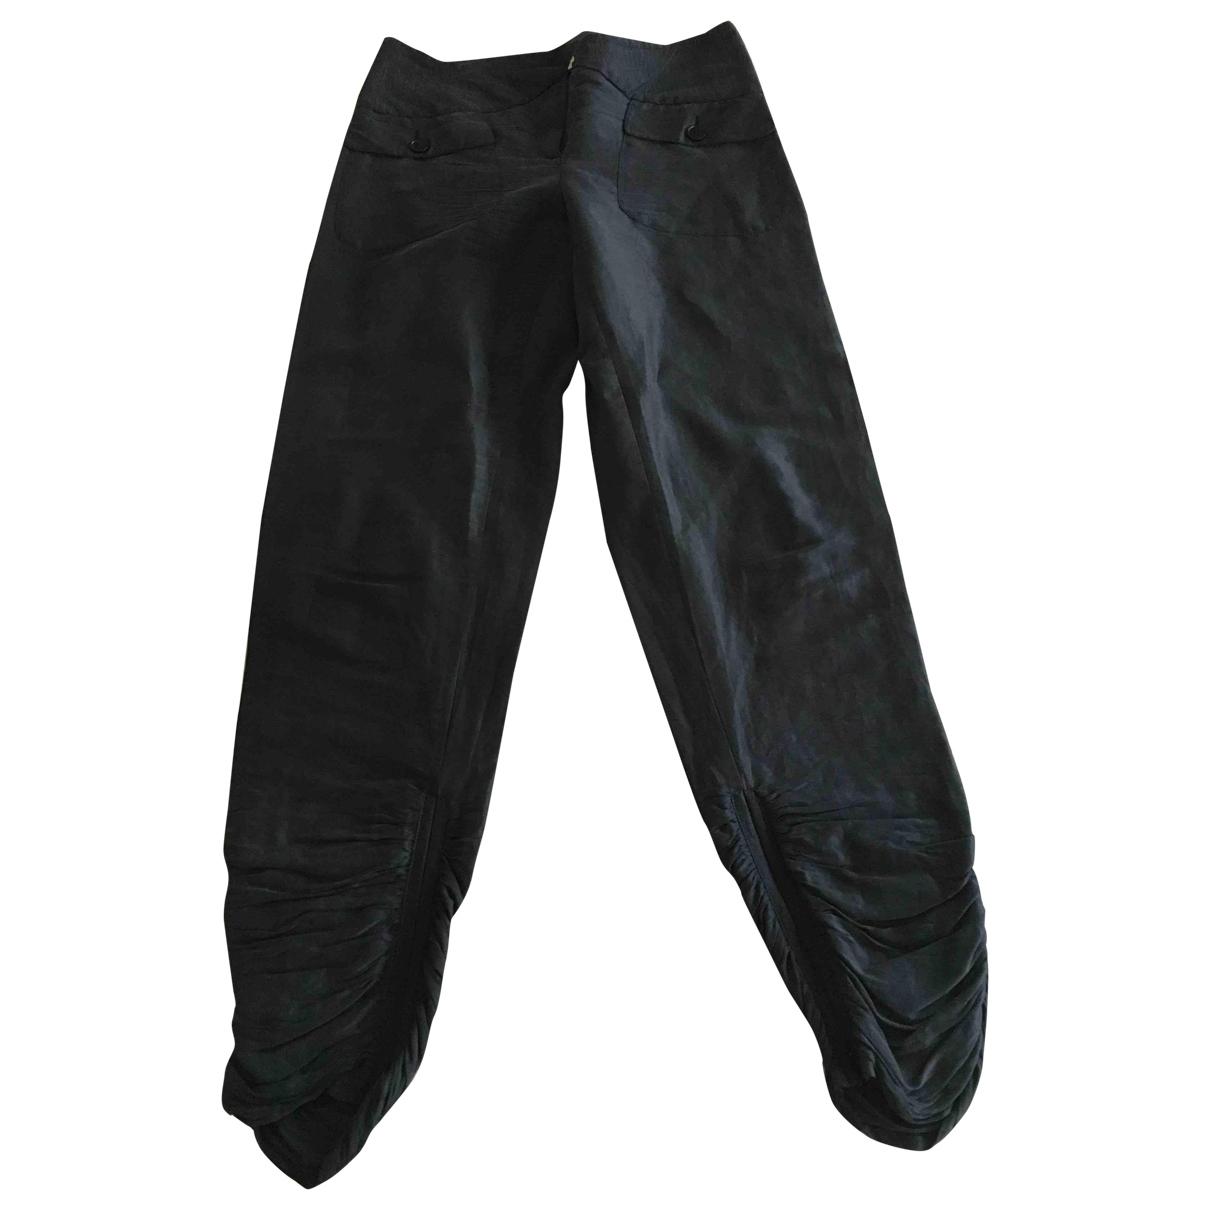 Emporio Armani \N Black Trousers for Women 42 IT